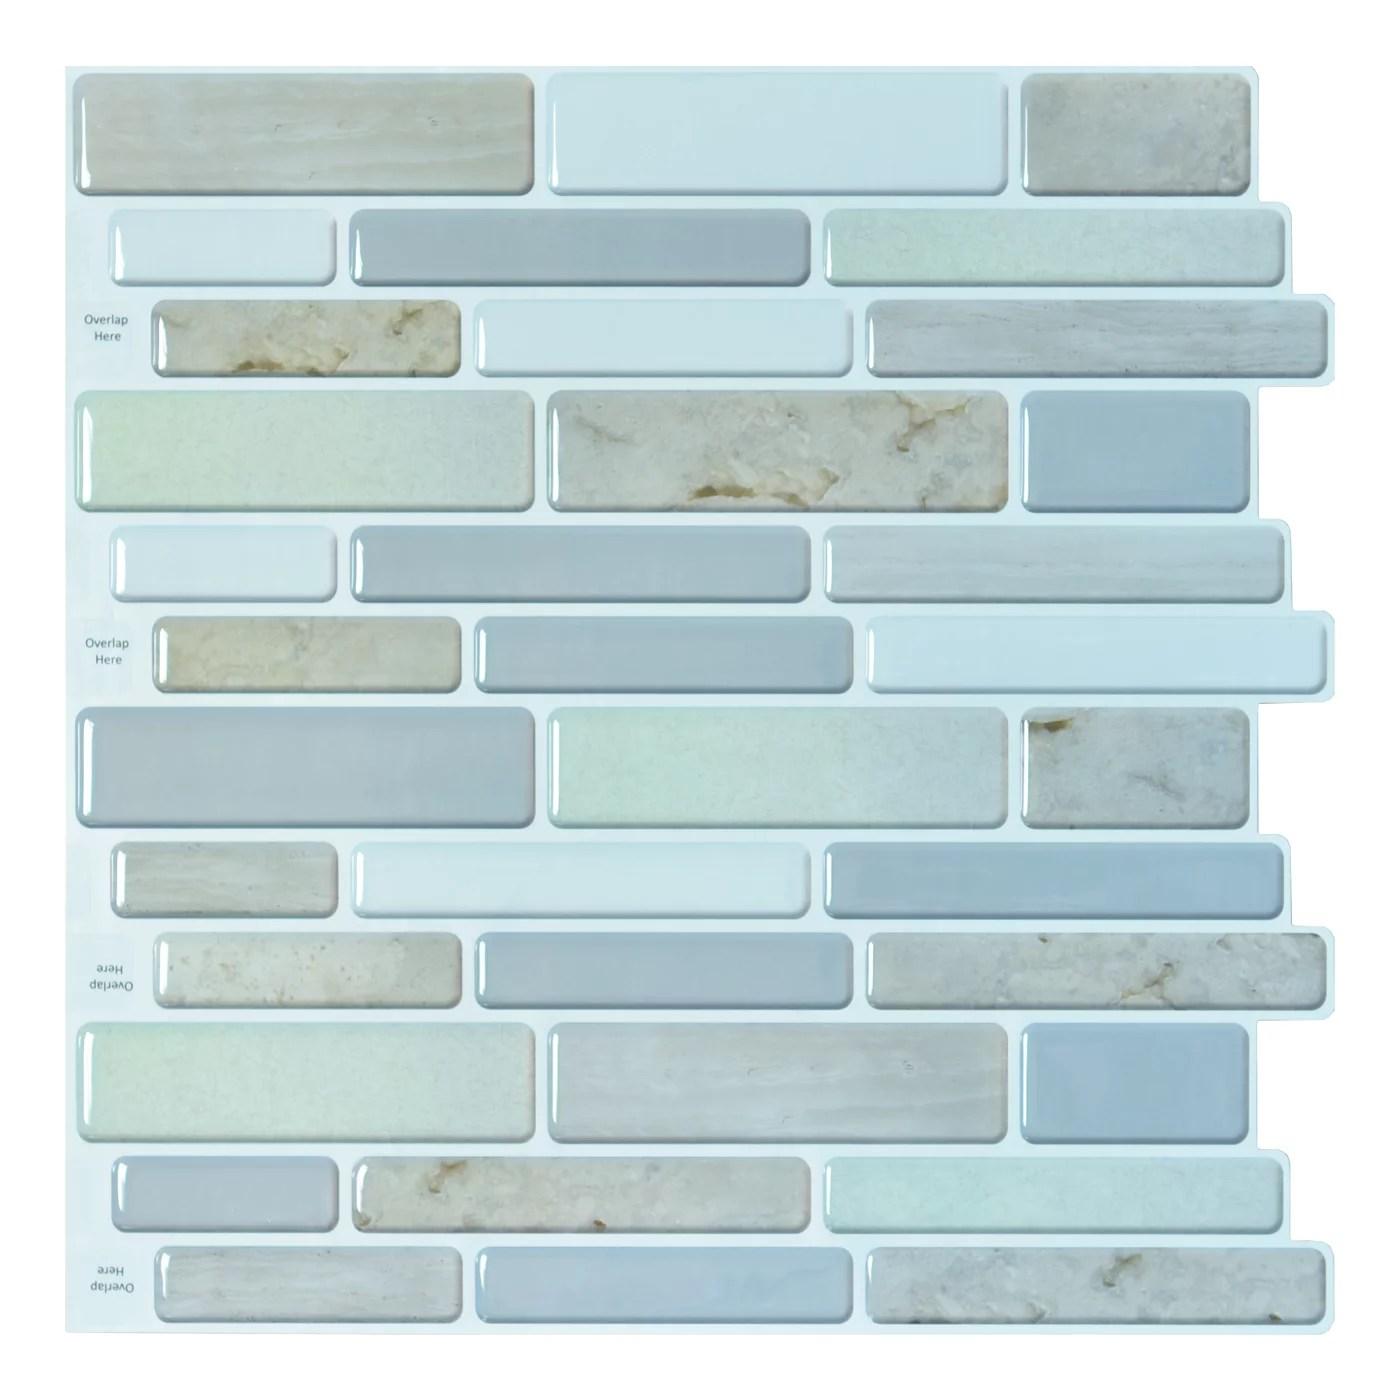 10 tiles self adhesive wall tile peel and stick backsplash tile for kitchen 12 x12 walmart com